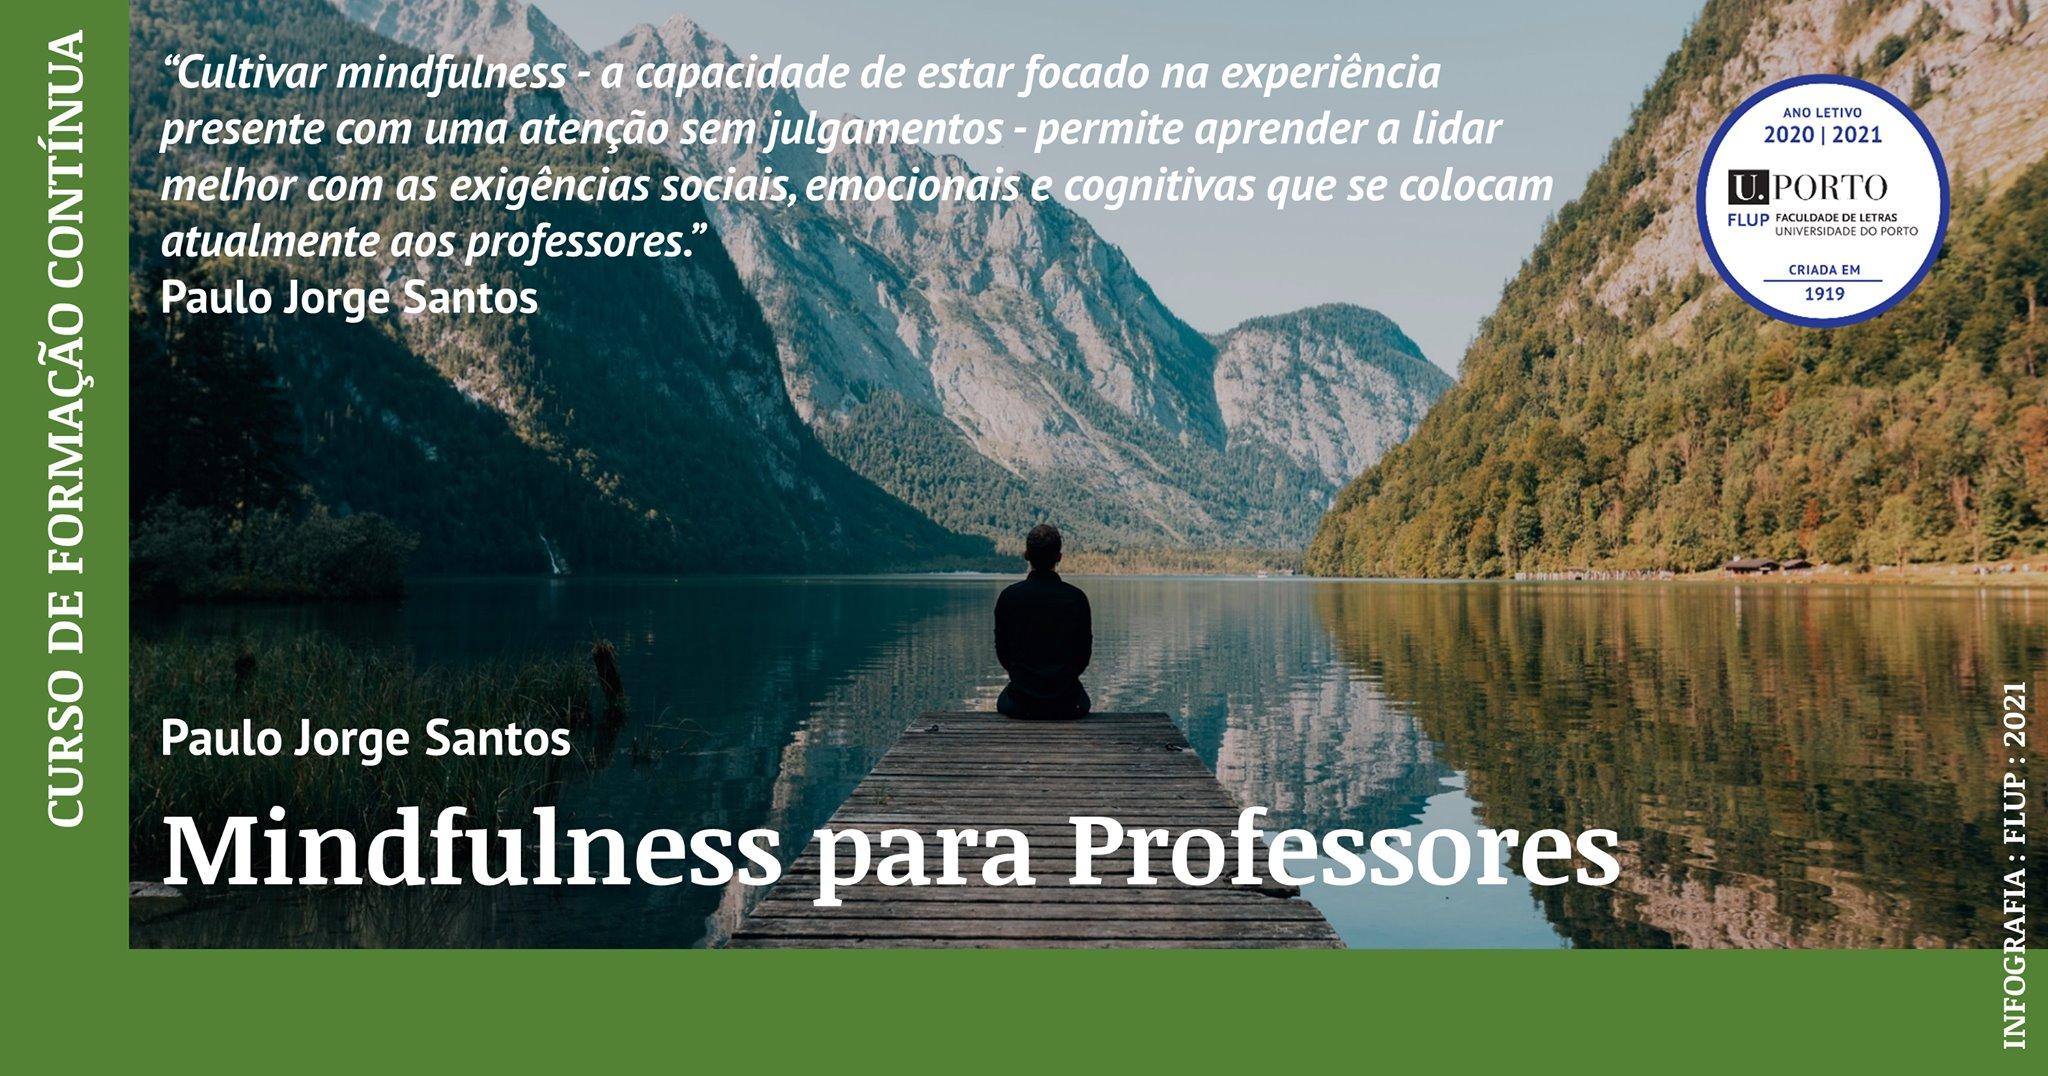 Mindfulness para Professores